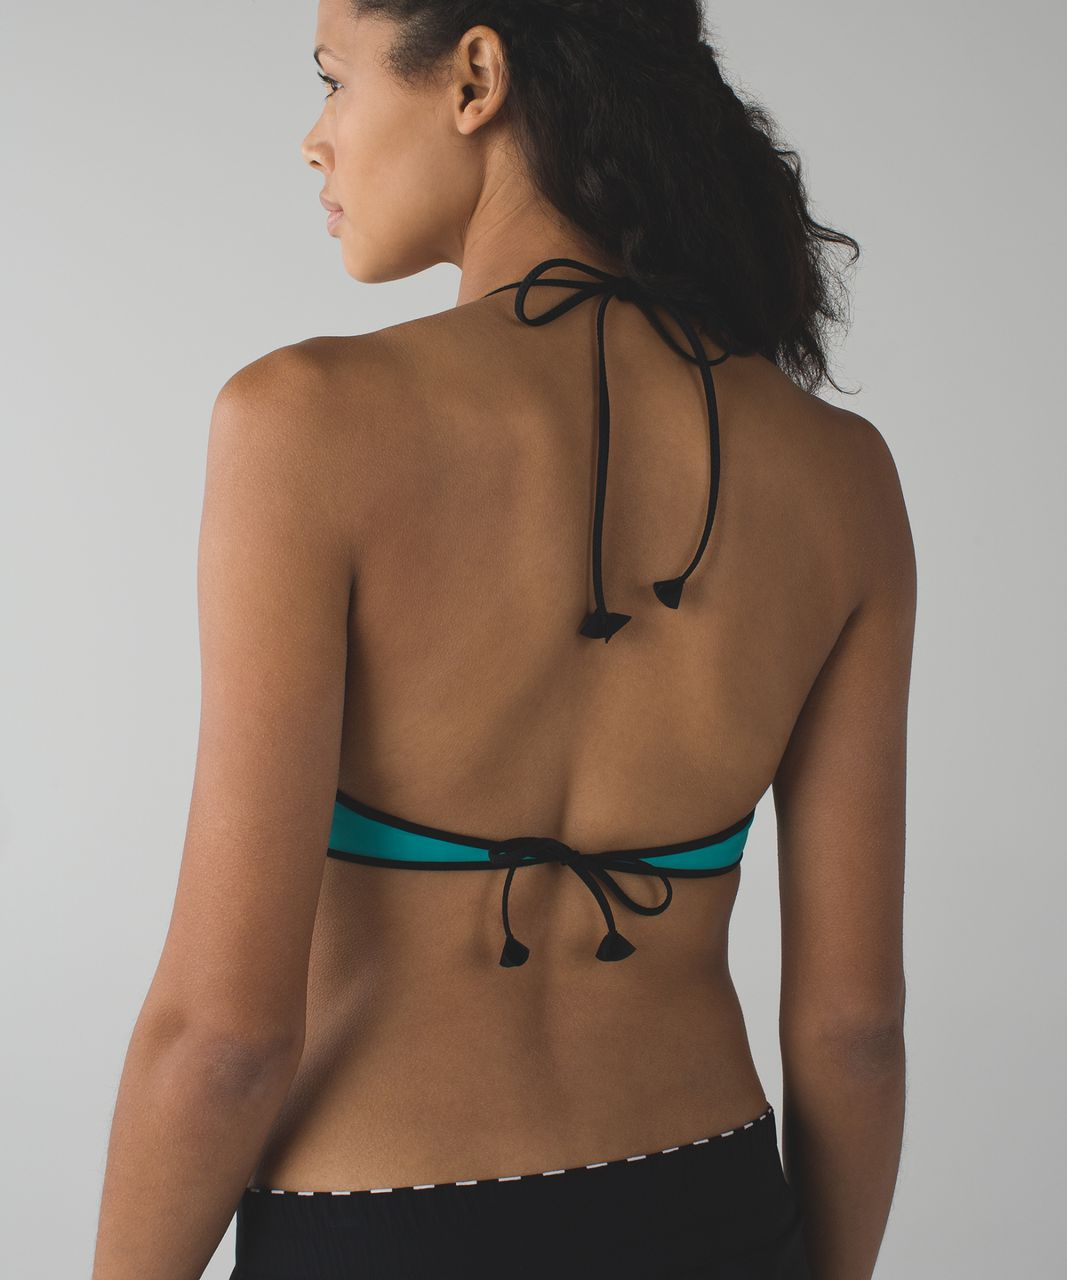 Lululemon Water:  Surf To Sand Tie Top - Peacock Blue / Black / Narrow Bold Stripe Vertical Printed White Black